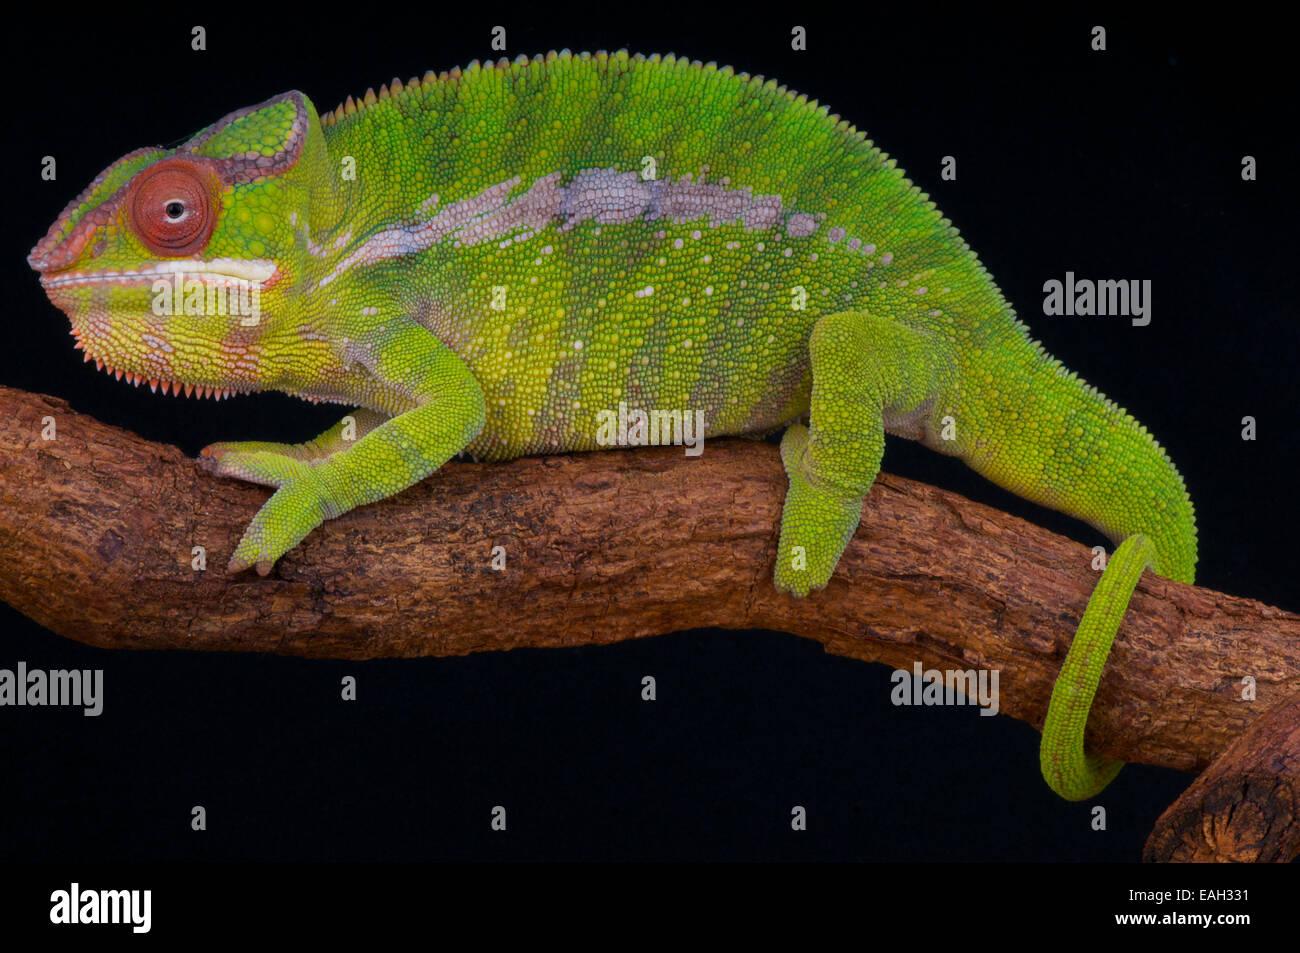 Pantherchamäleon / Furcifer Pardalis Stockbild